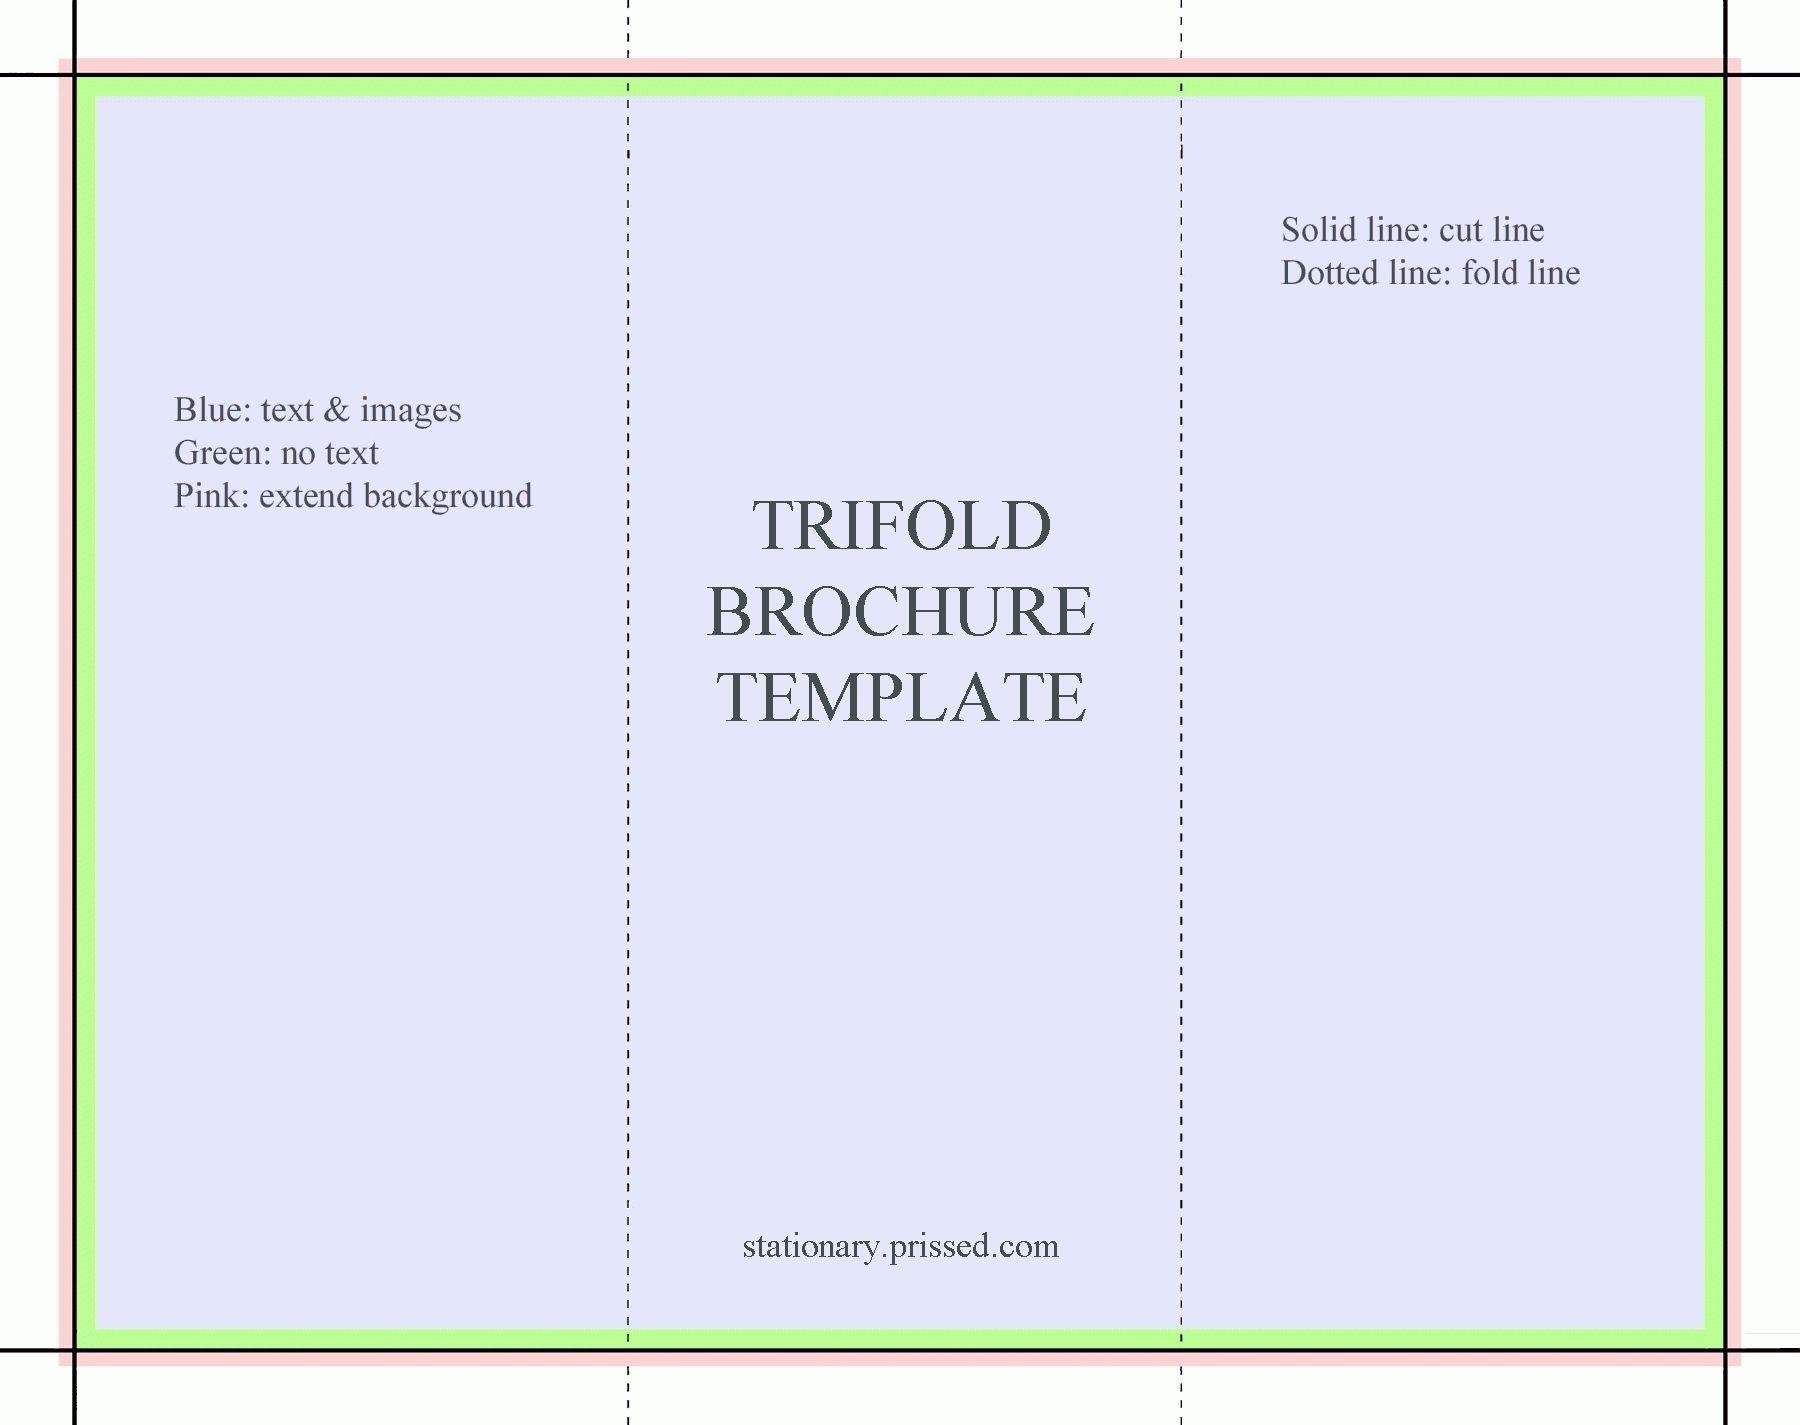 Template Ideas Google Docs Templates Brochure Tri Fold Future In Google Docs Templates Brochure